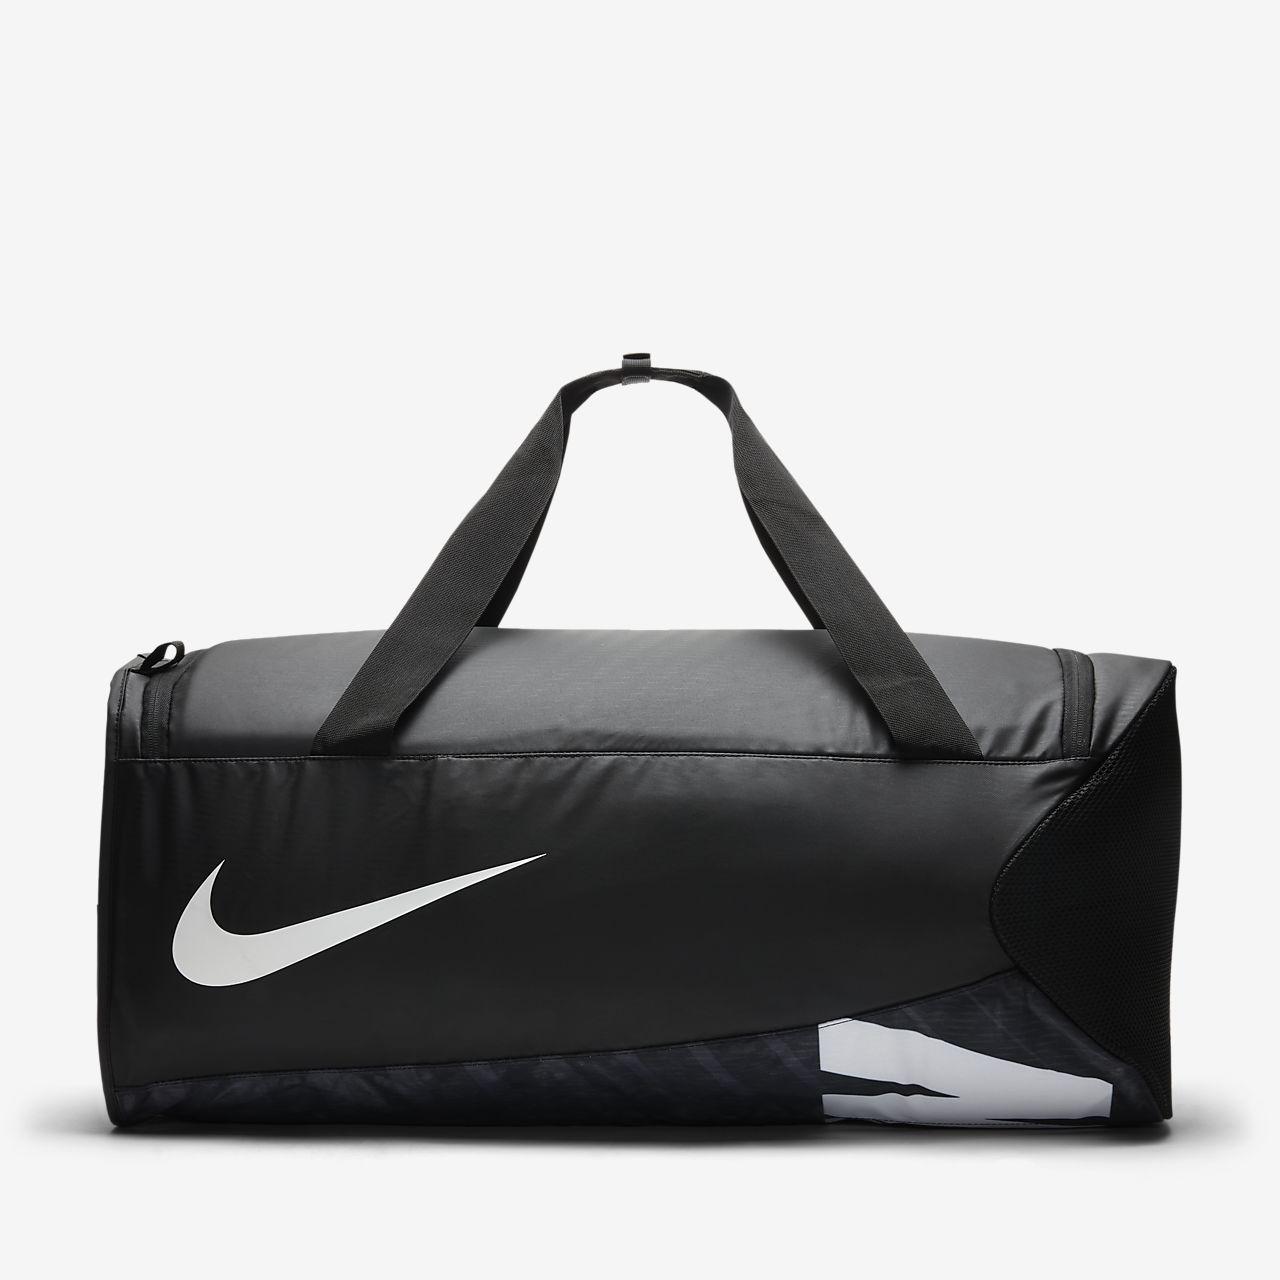 b46f512bbc Nike Alpha Adapt Crossbody Large Duffel Black Bag